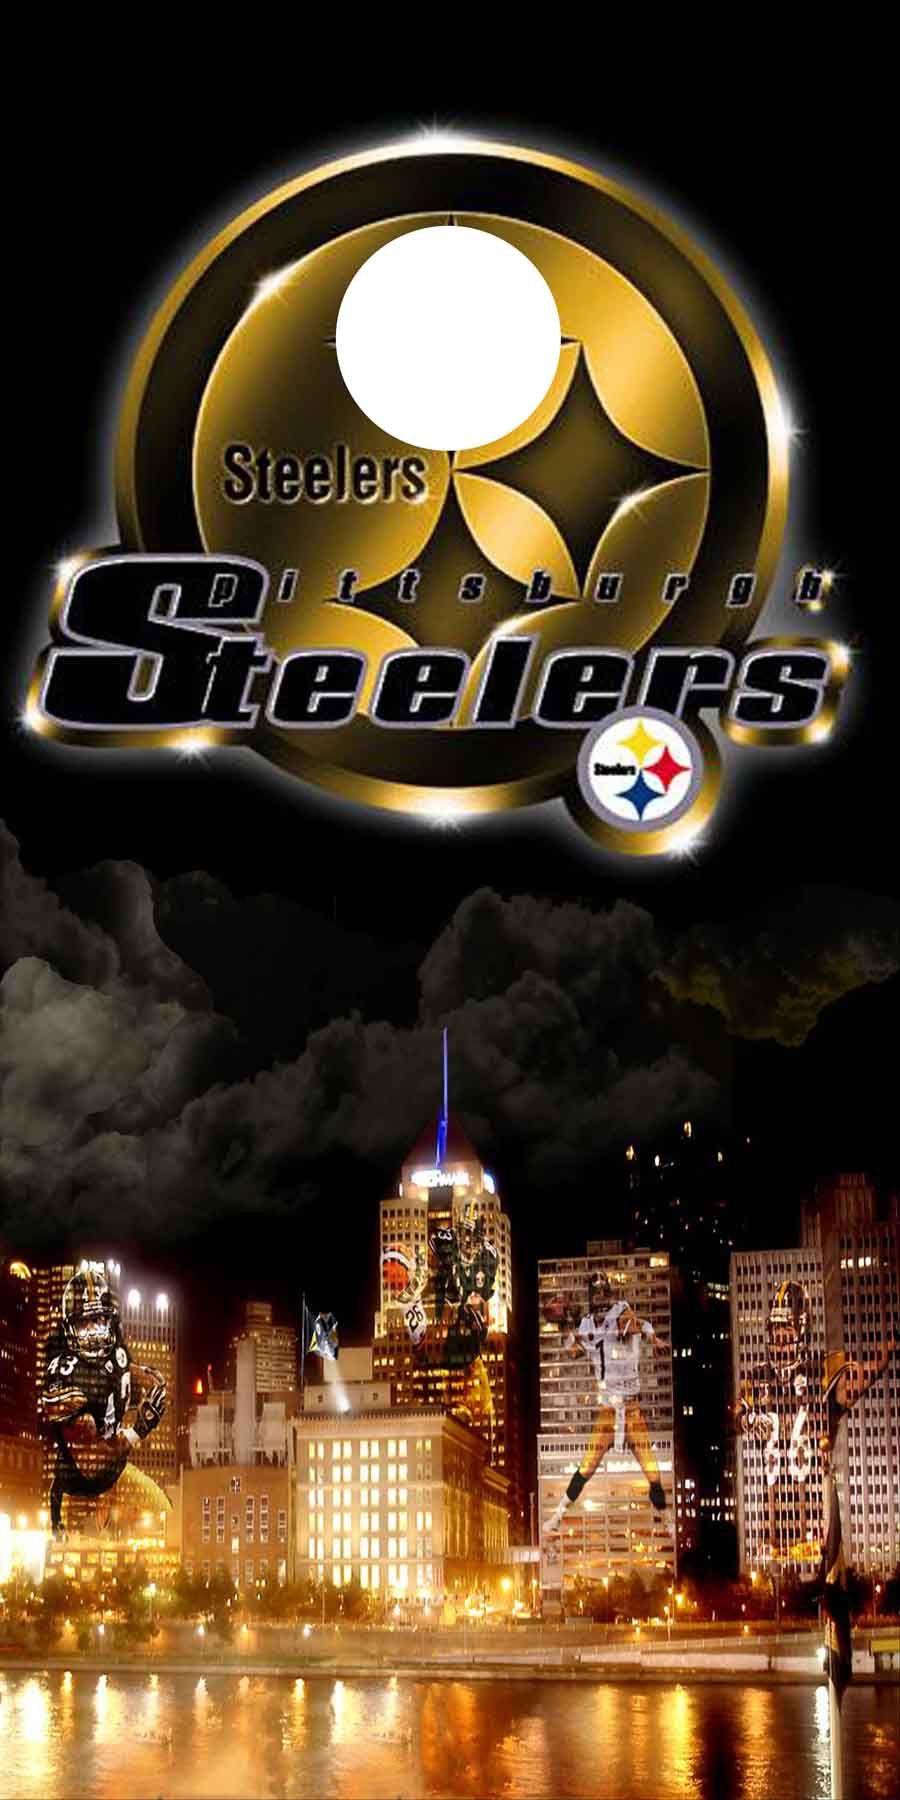 Steelers Pitsburgh steelers, Pittsburgh steelers logo